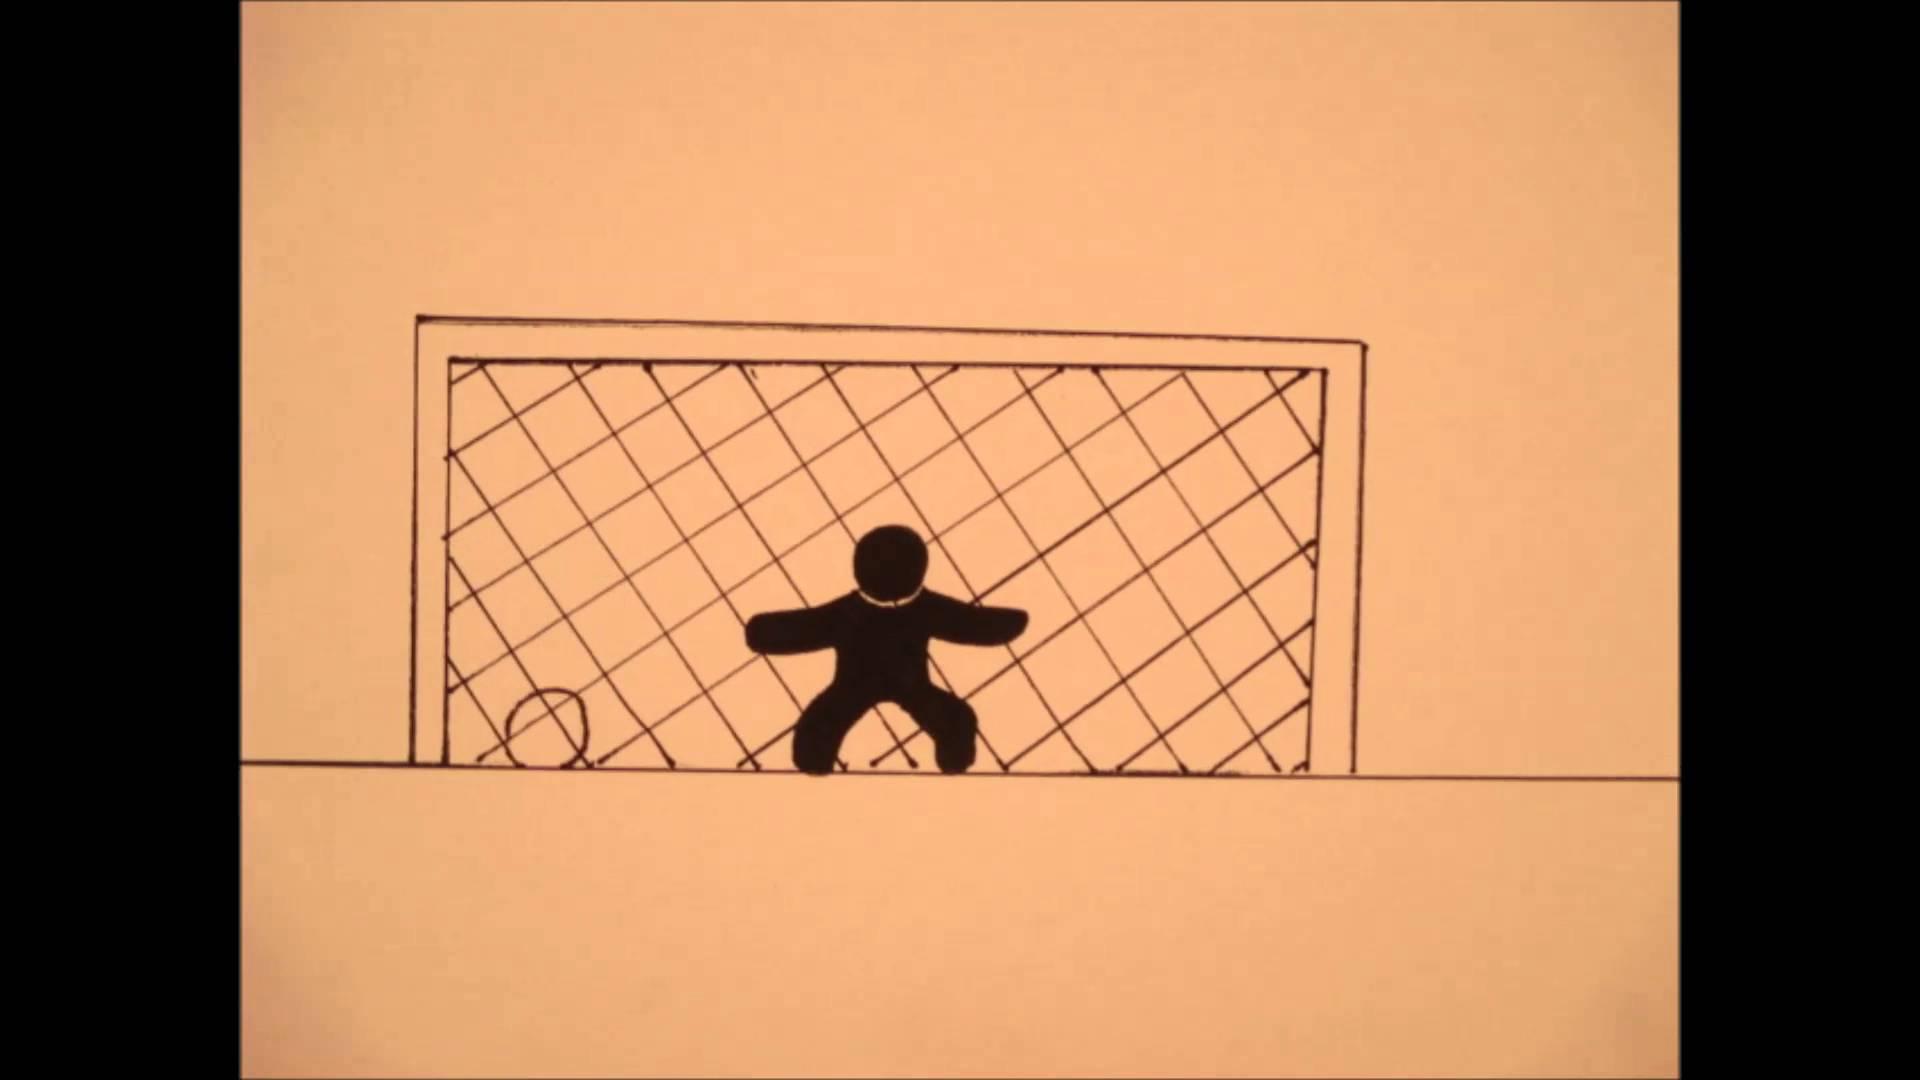 1920x1080 Soccer Goal Drawn Animation By Mabbott